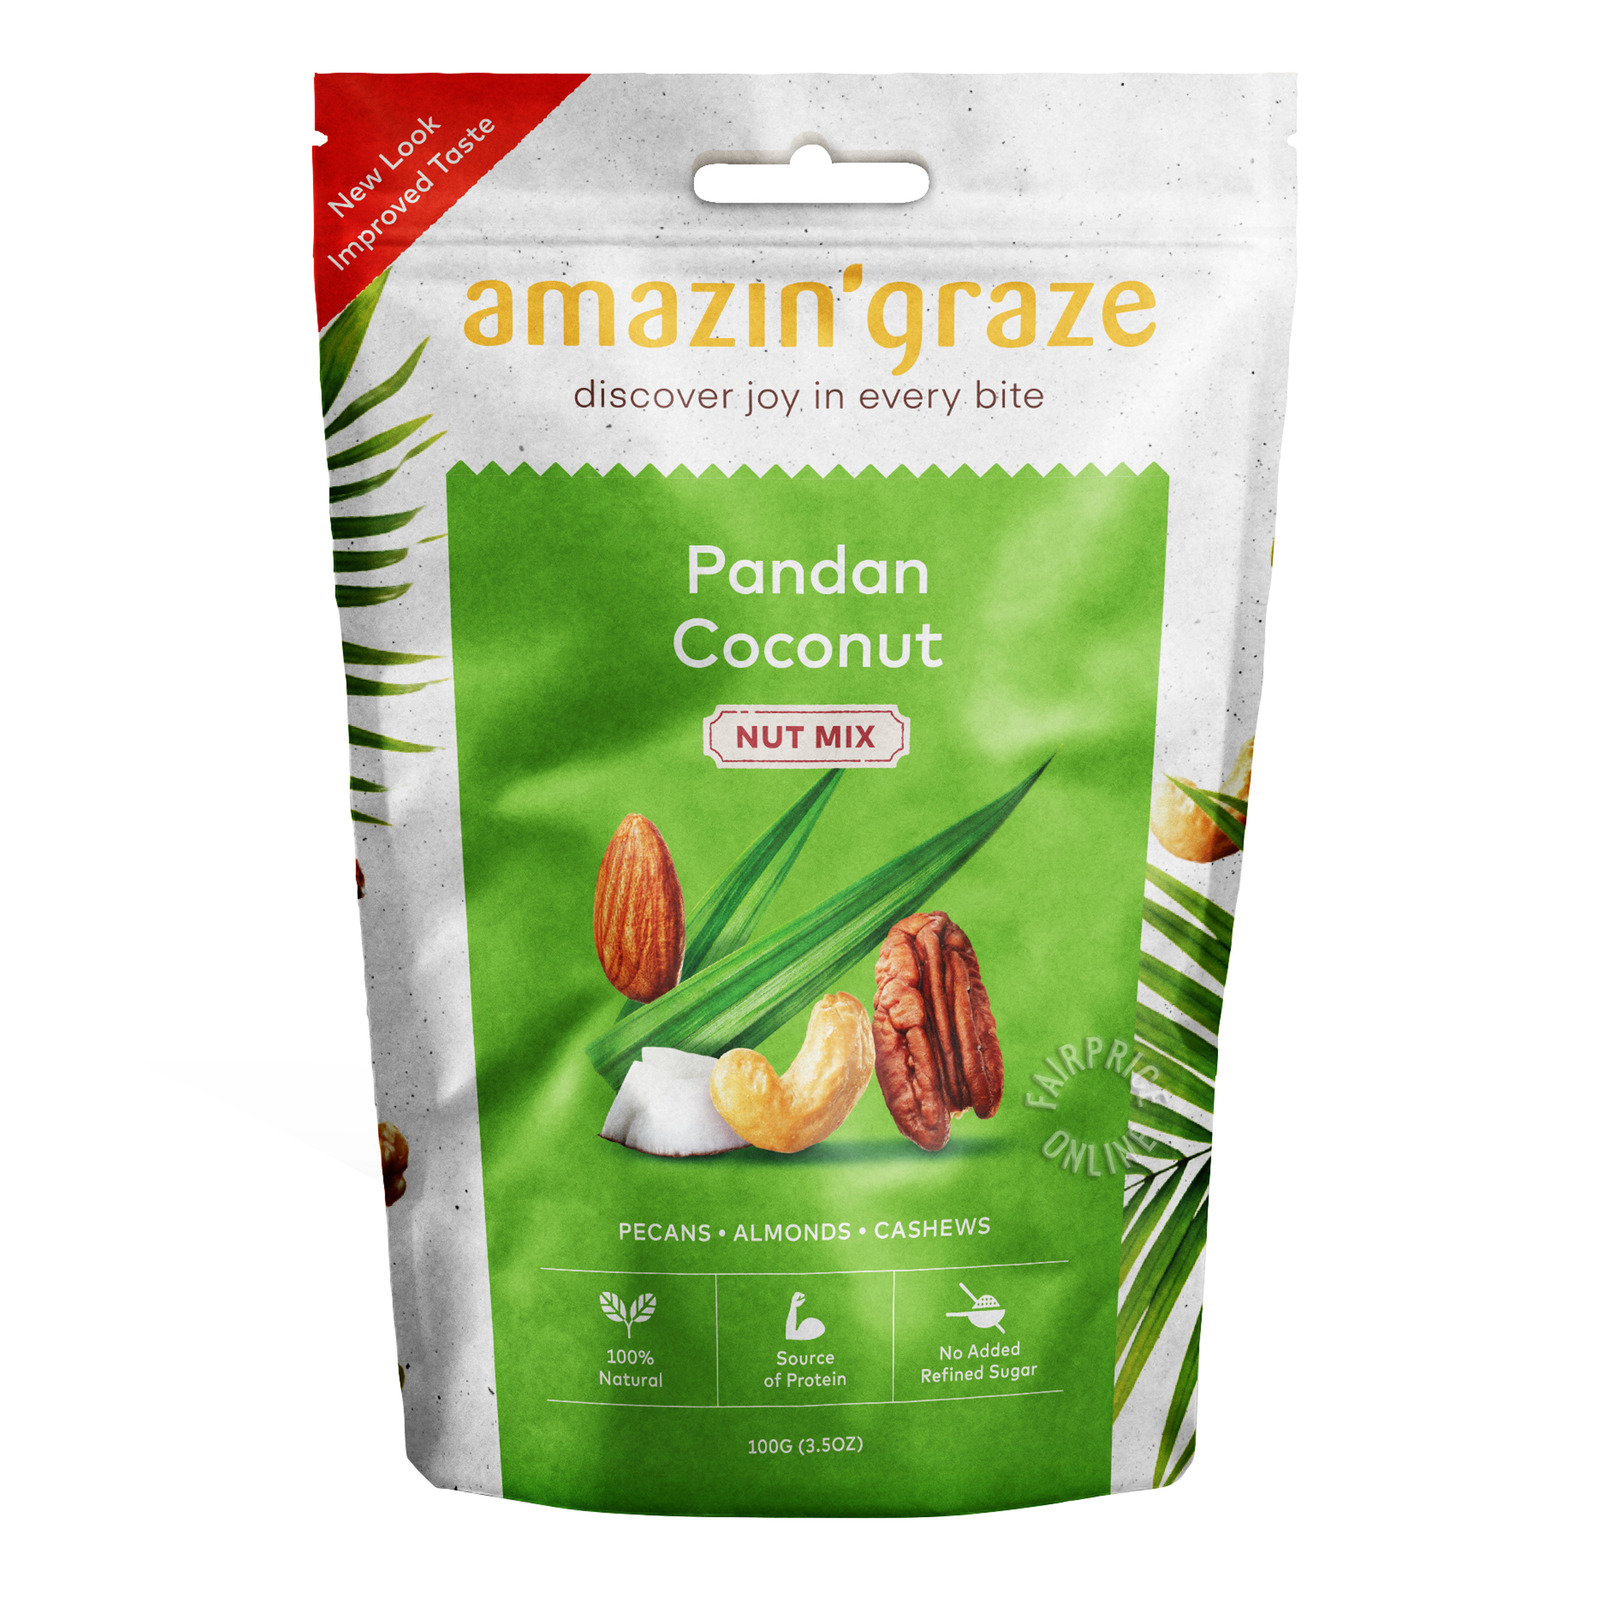 Amazin' Graze Nut Mix - Pandan Coconut